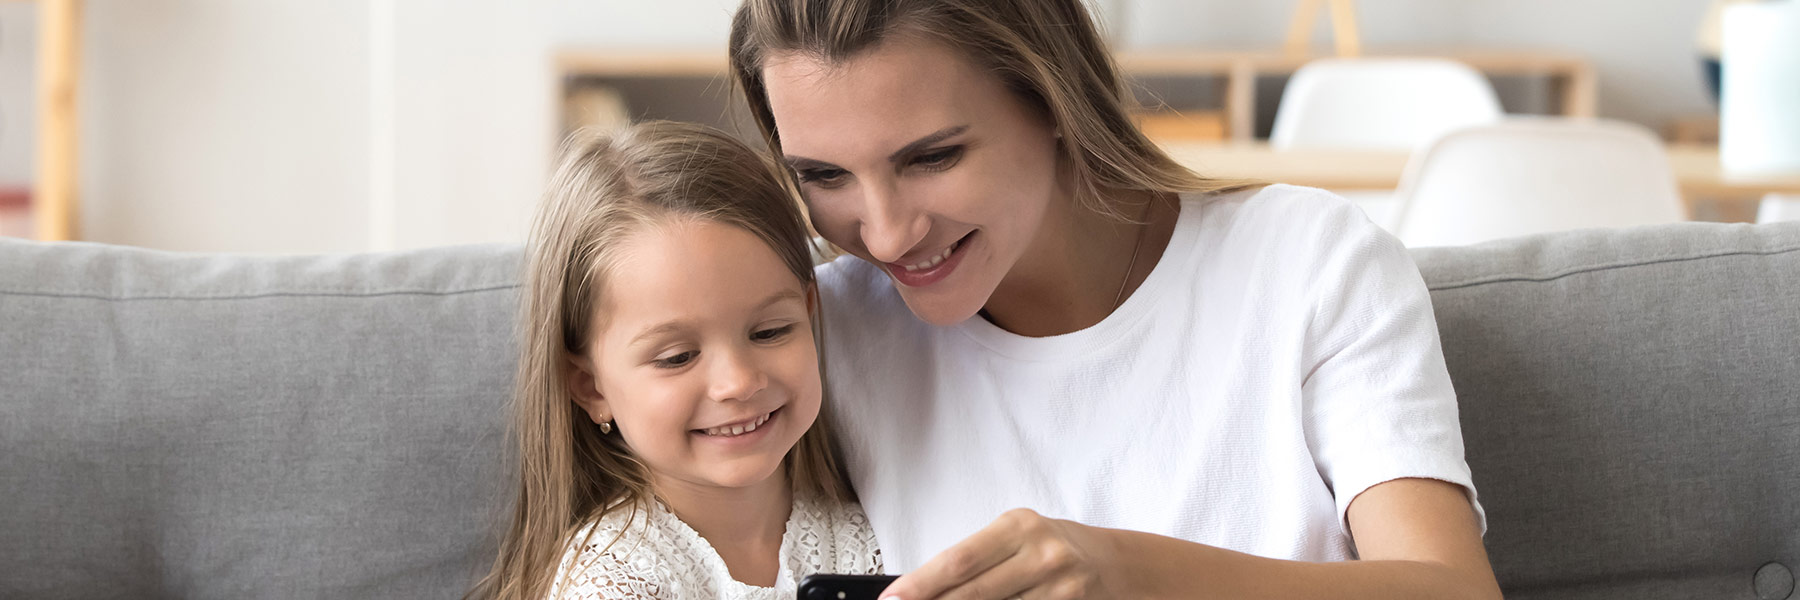 MyAir-mum-and-daughter-shutterstock_1231591525_188x600px-res-opt